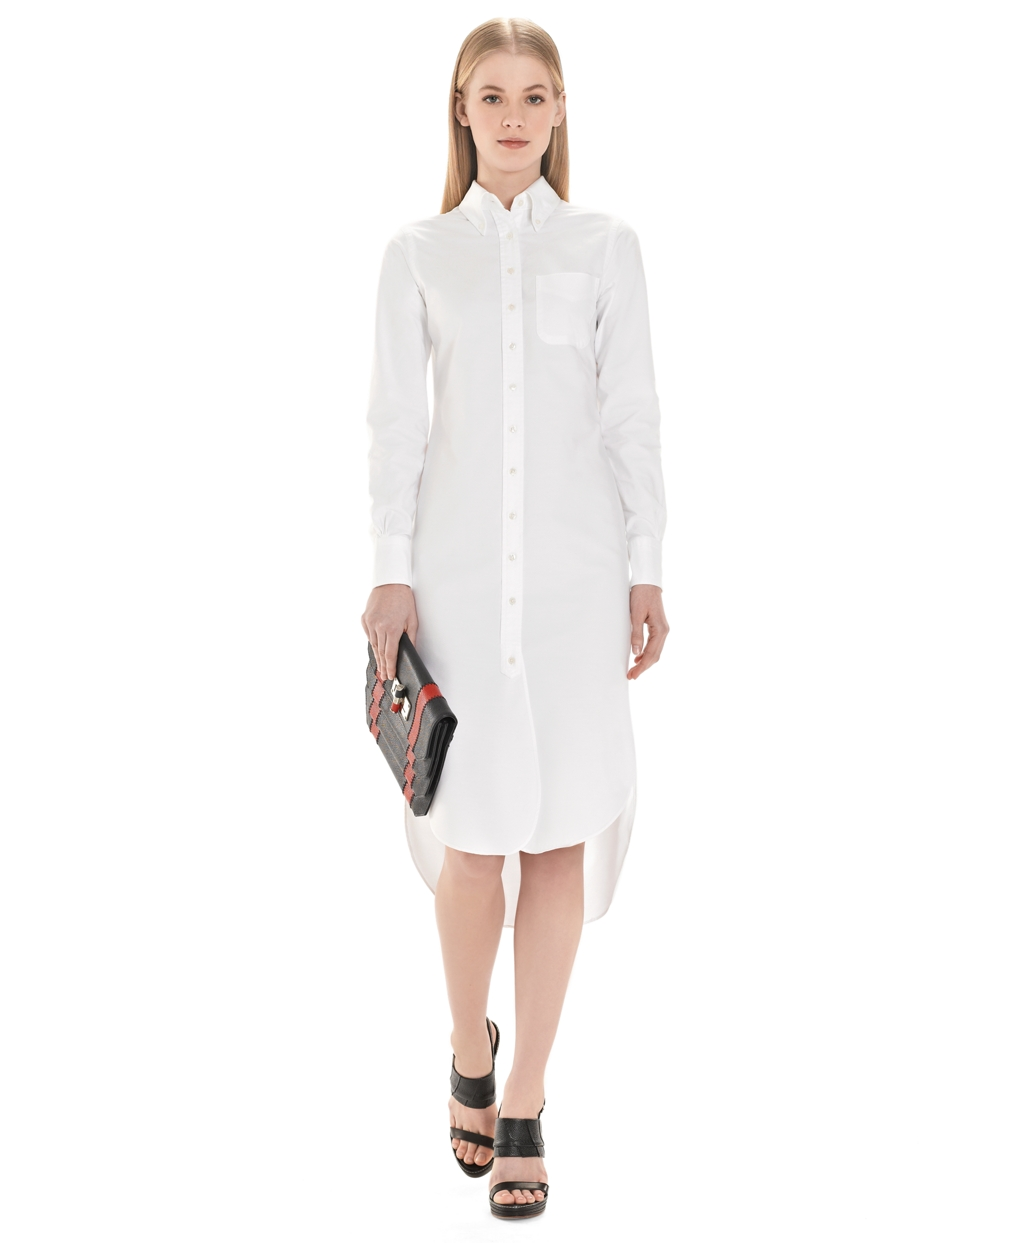 6065e16b150ab Women s White Button-Down Shirt Dress